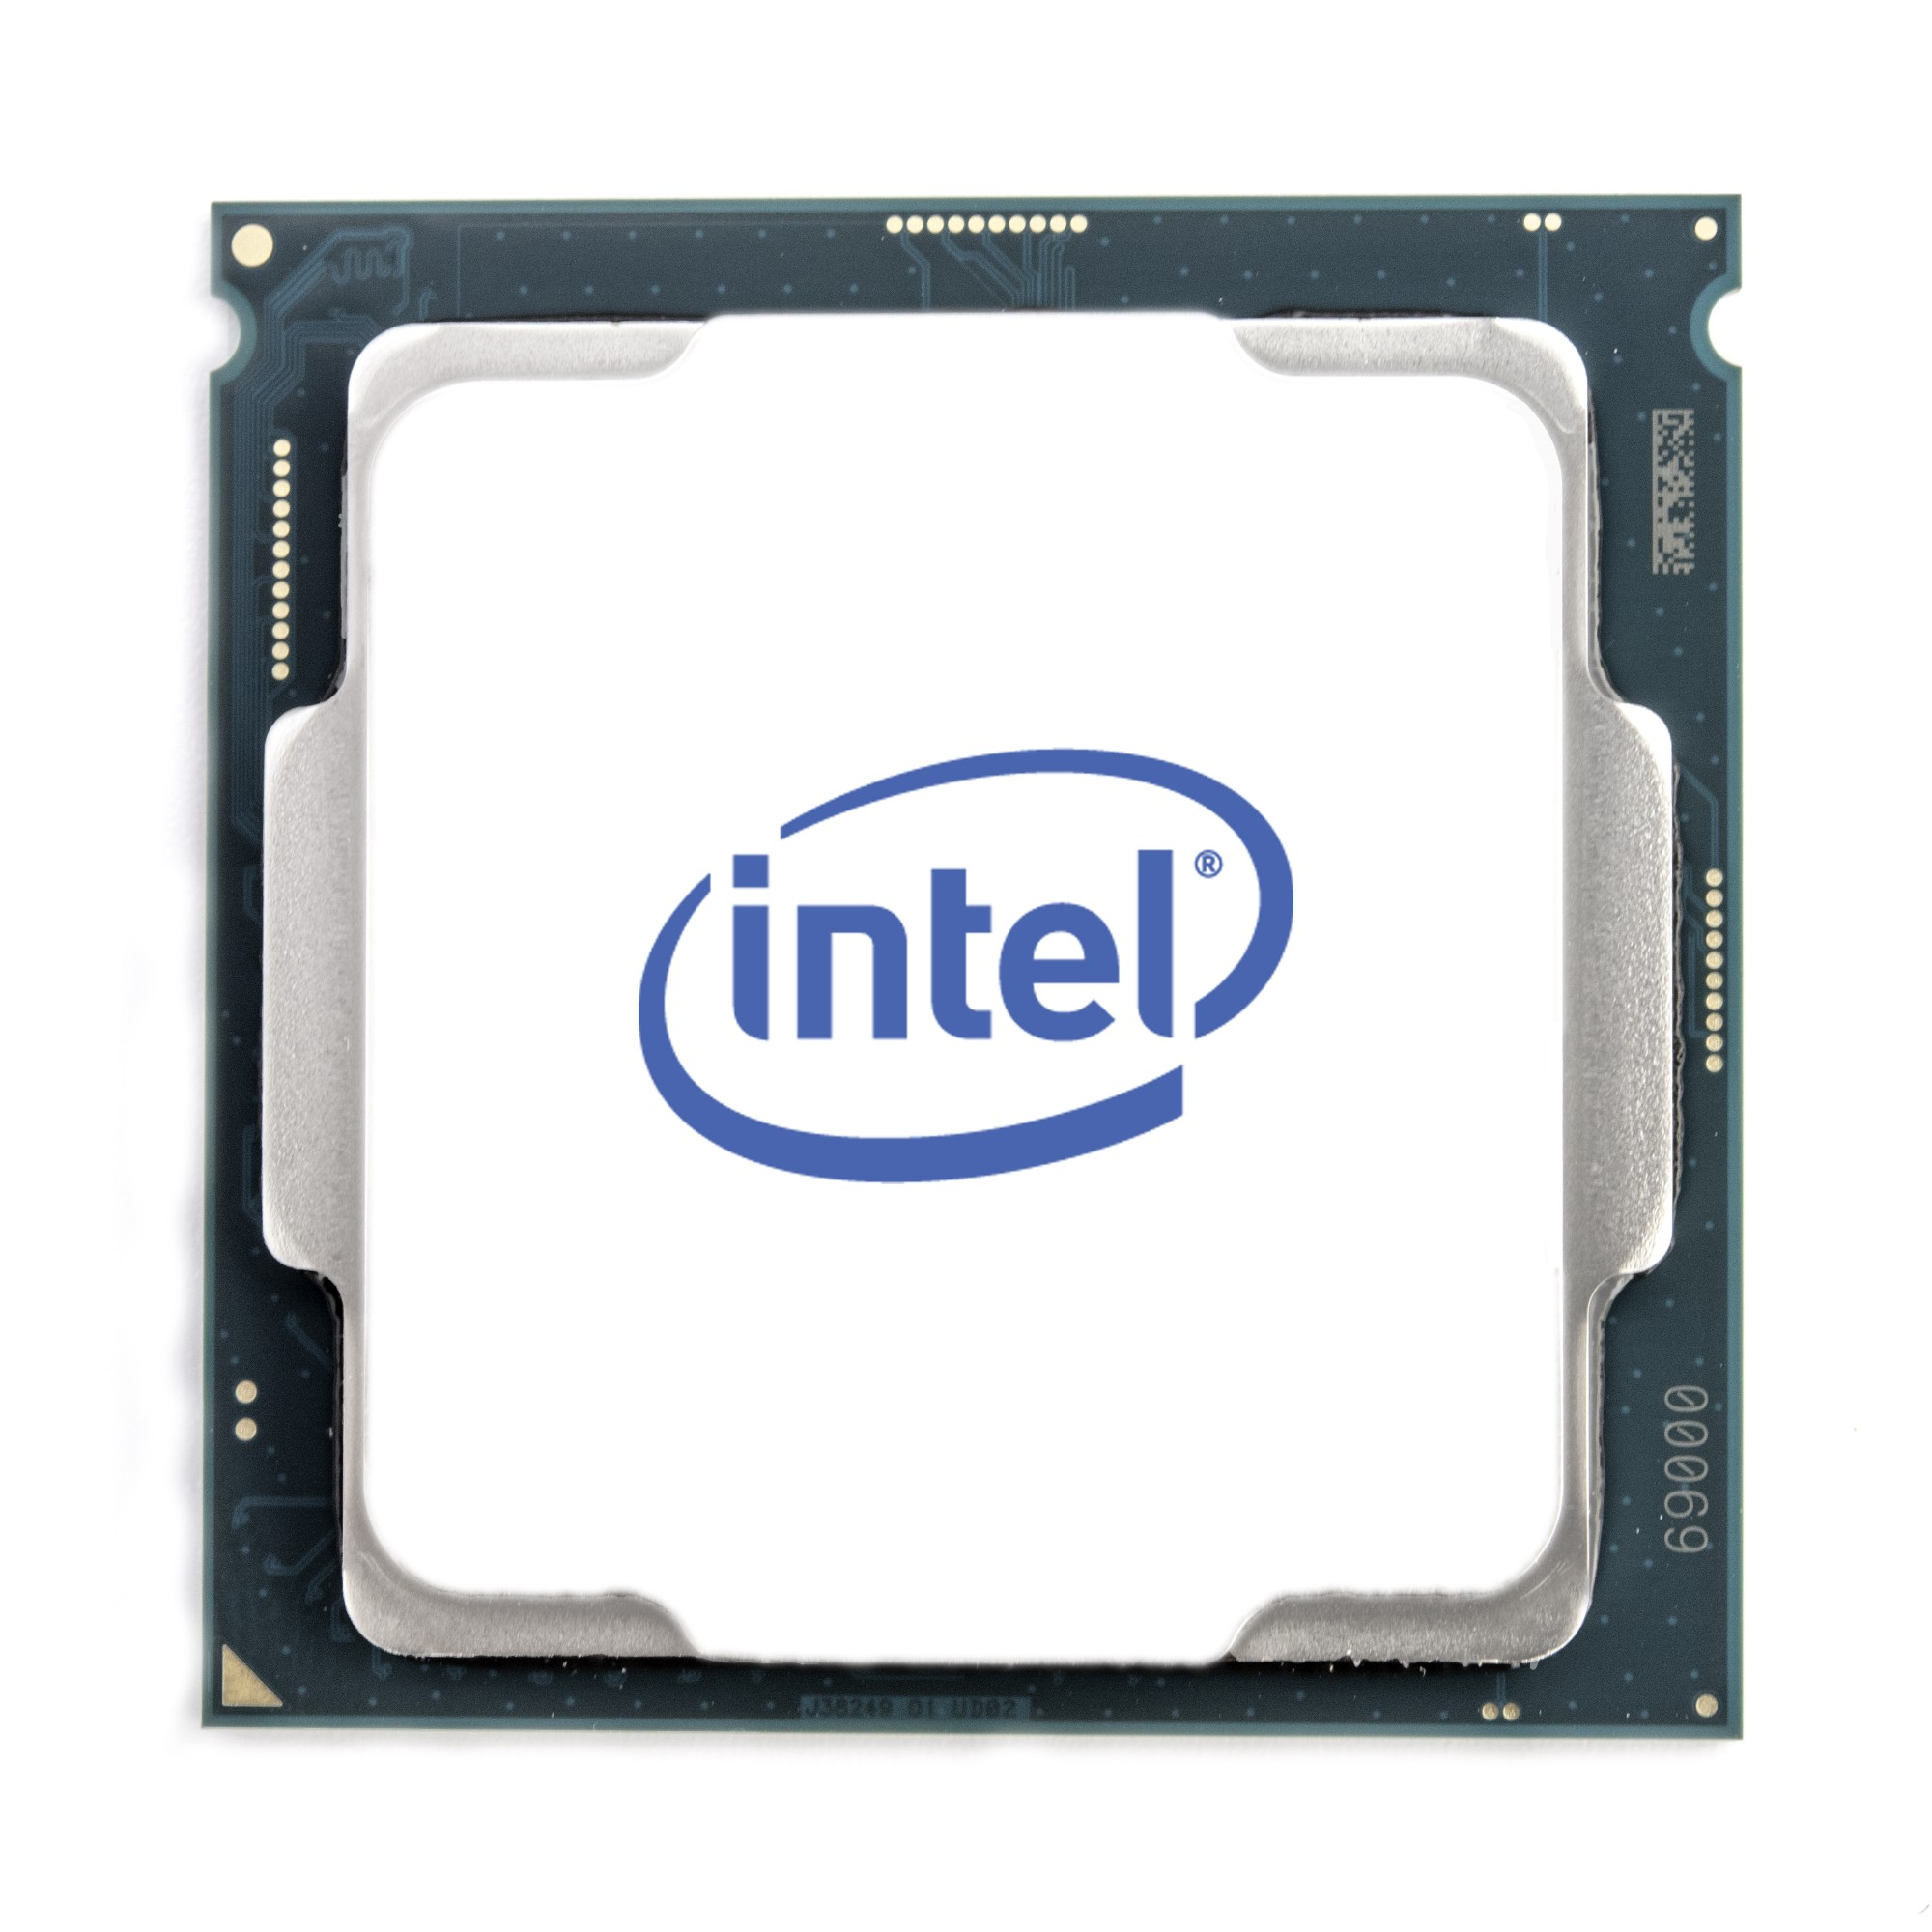 Intel Xeon E-2234 processor 3.6 GHz Box 8 MB